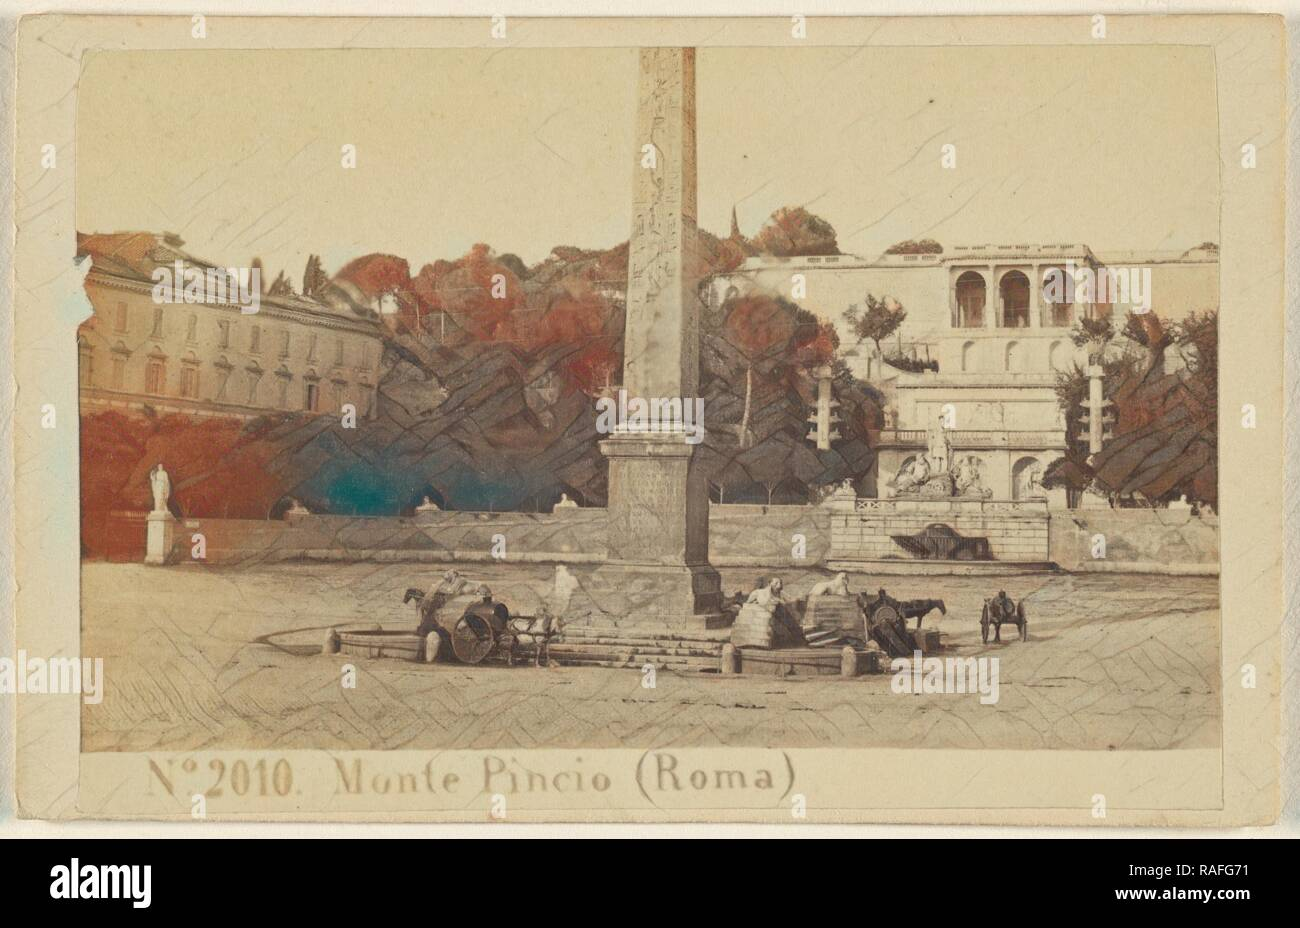 Monte Pincio (Roma), Sommer & Behles (Italian, 1867 - 1874), 1870 - 1875, Albumen silver print. Reimagined - Stock Image